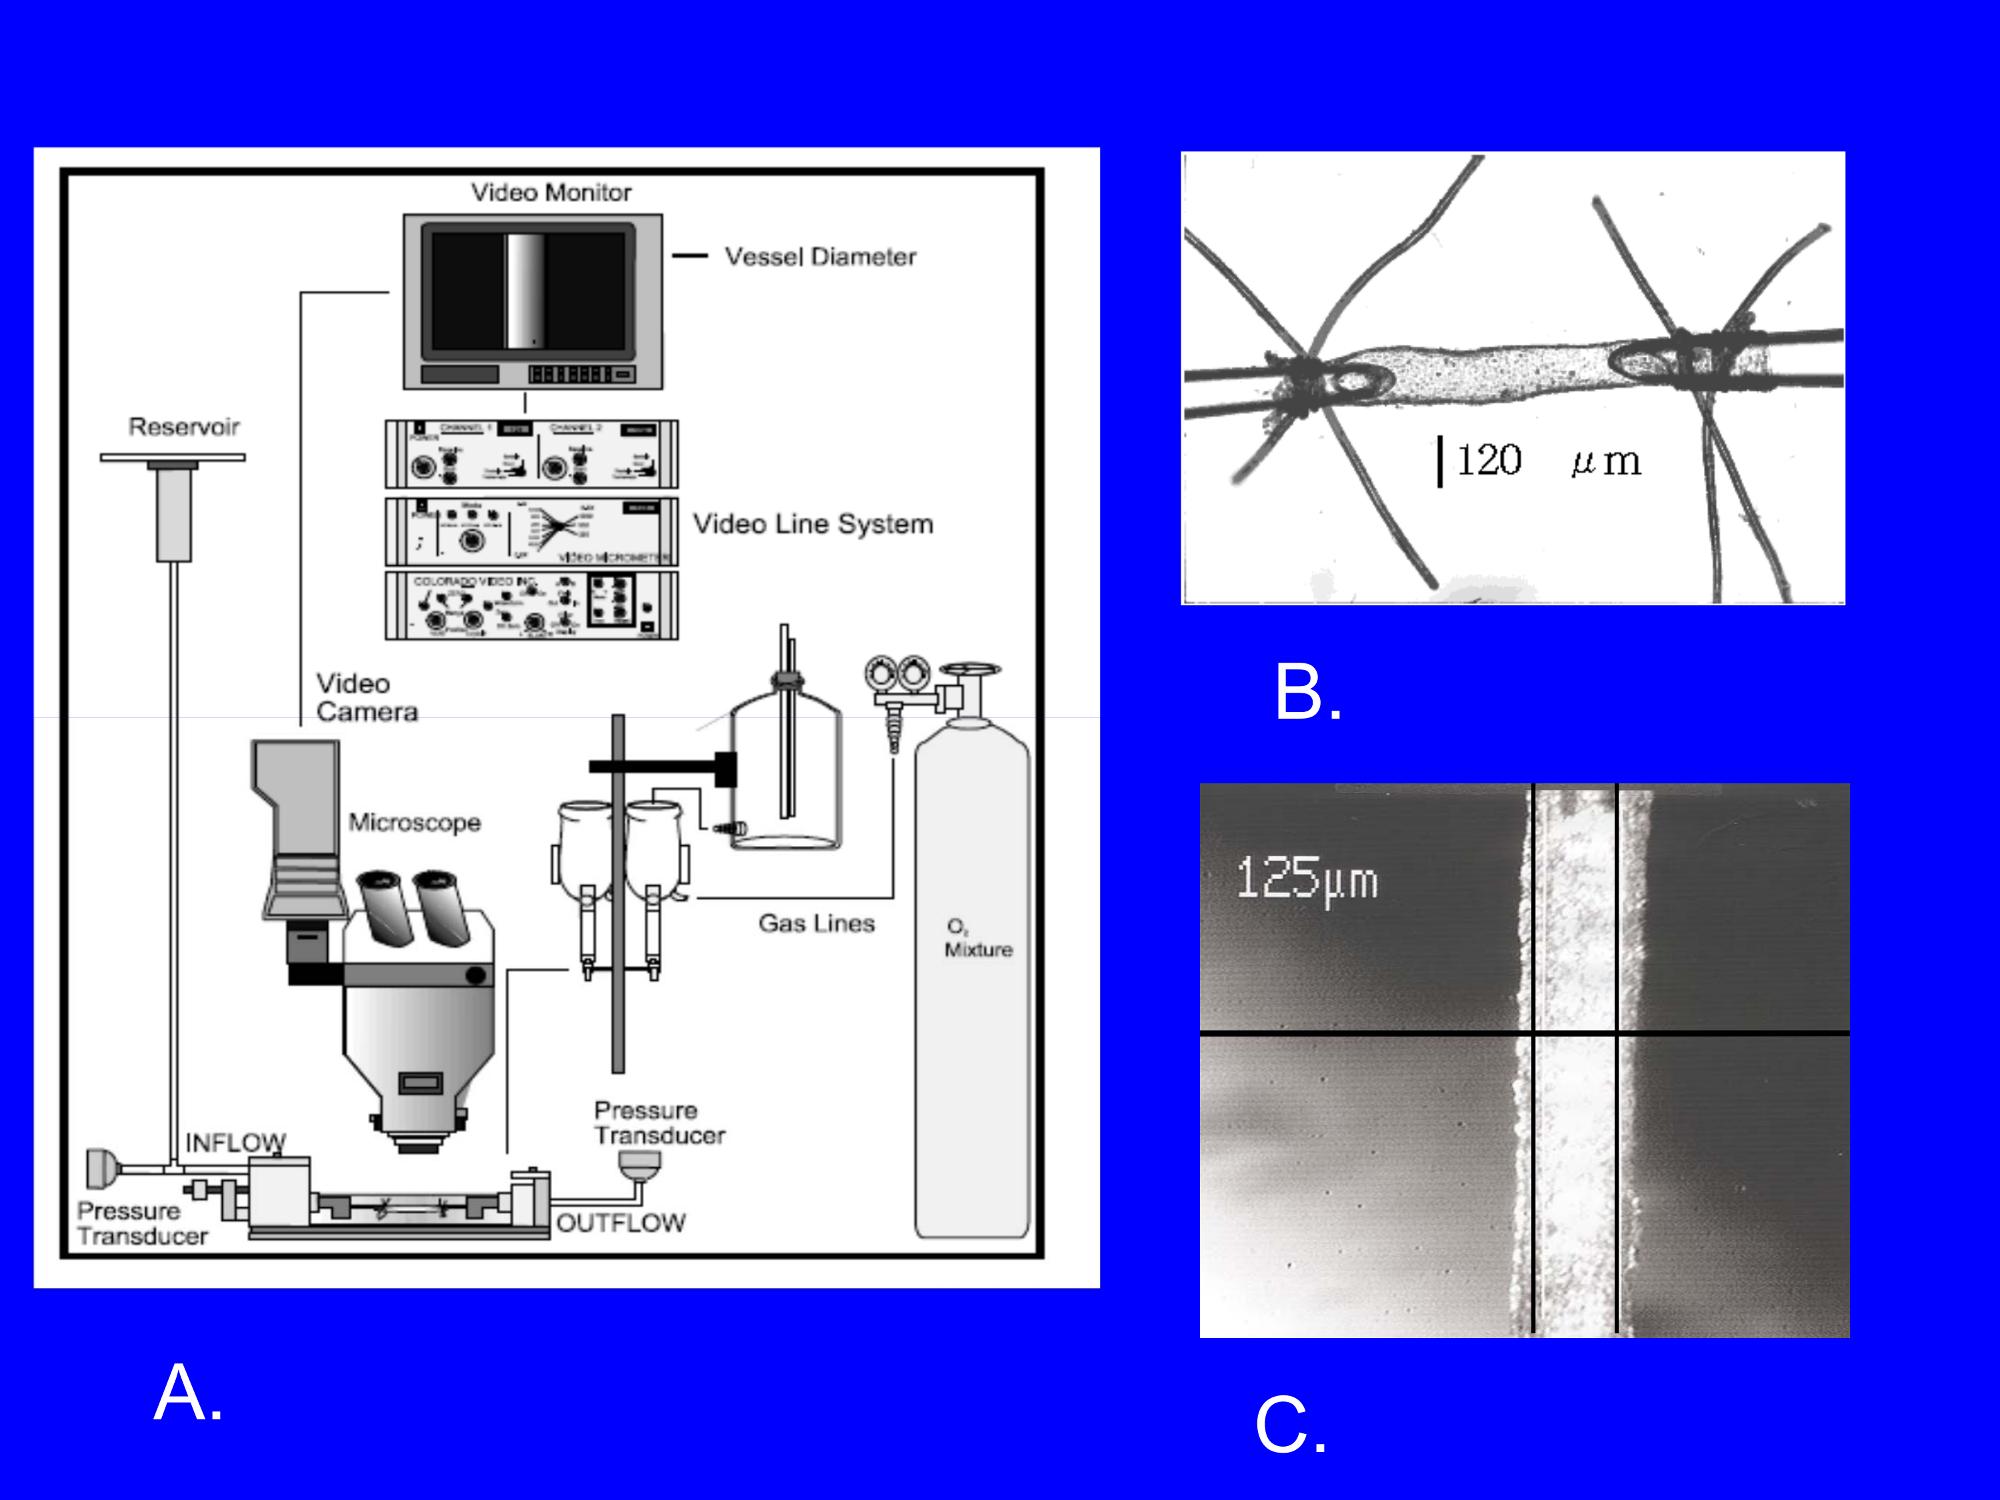 Evaluation of Vascular Control Mechanisms Utilizing Video ... on